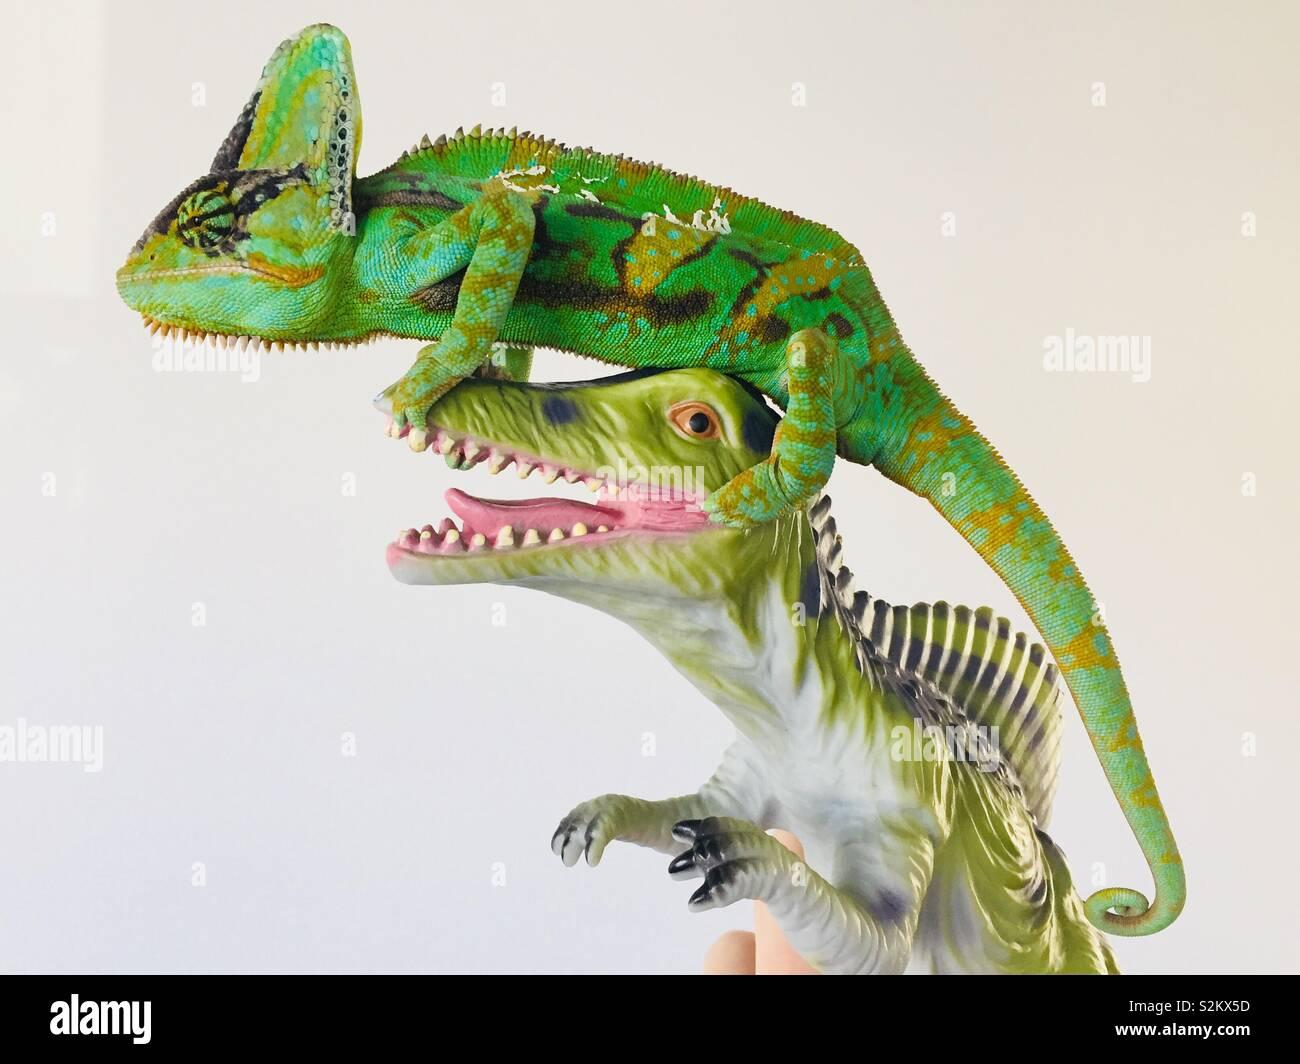 Dinosaures & caméléons Banque D'Images